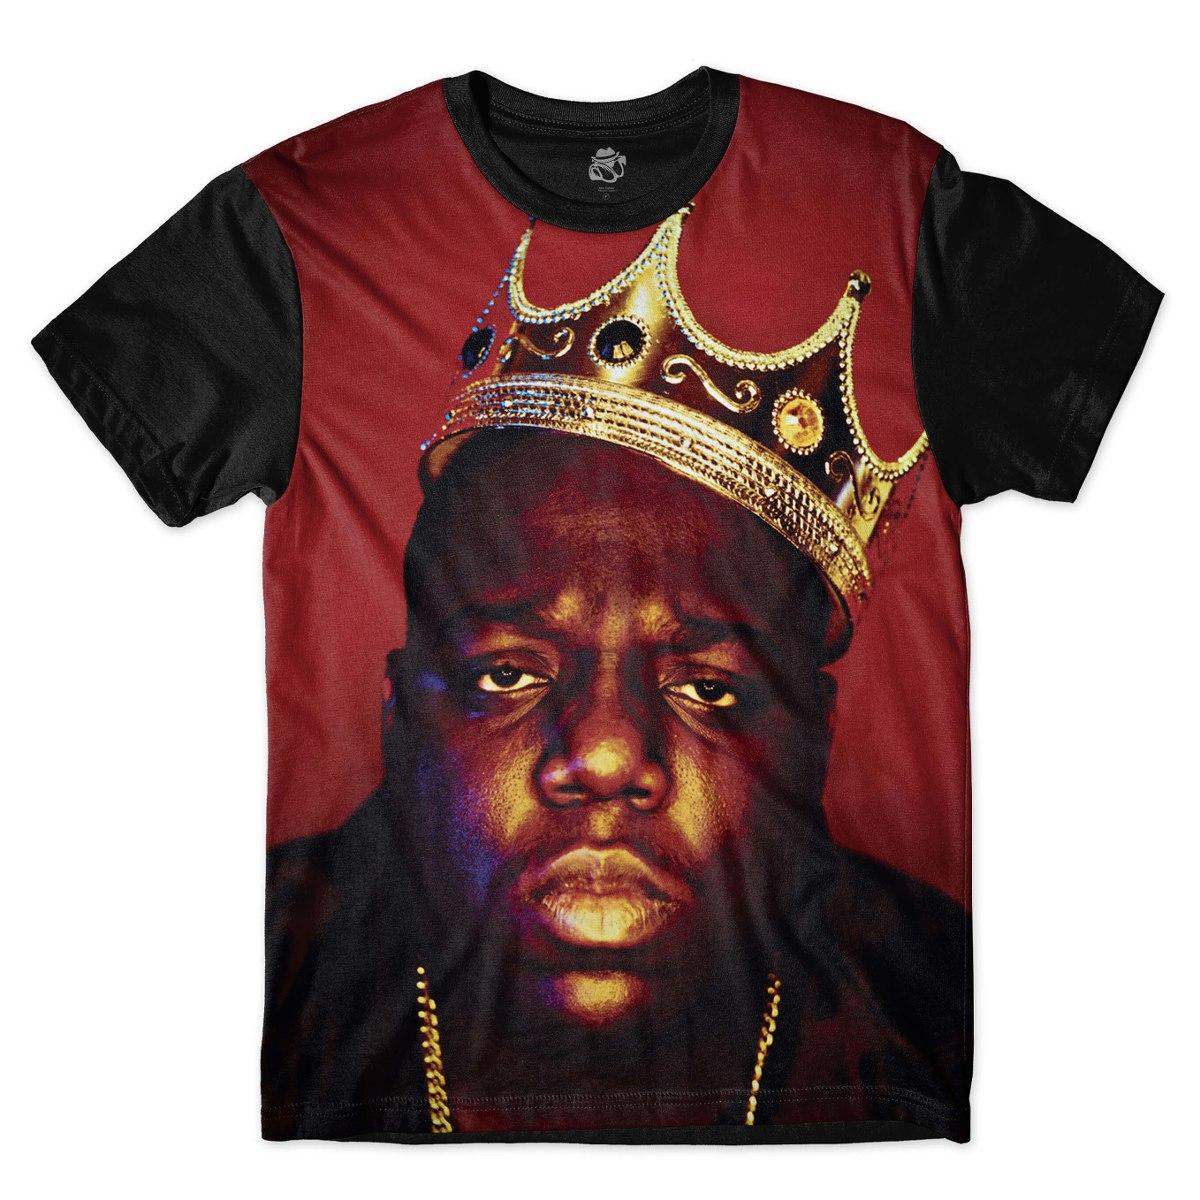 dfe5341c6 camisa camiseta rap hip hop rapper gangster notorious big. Carregando zoom.